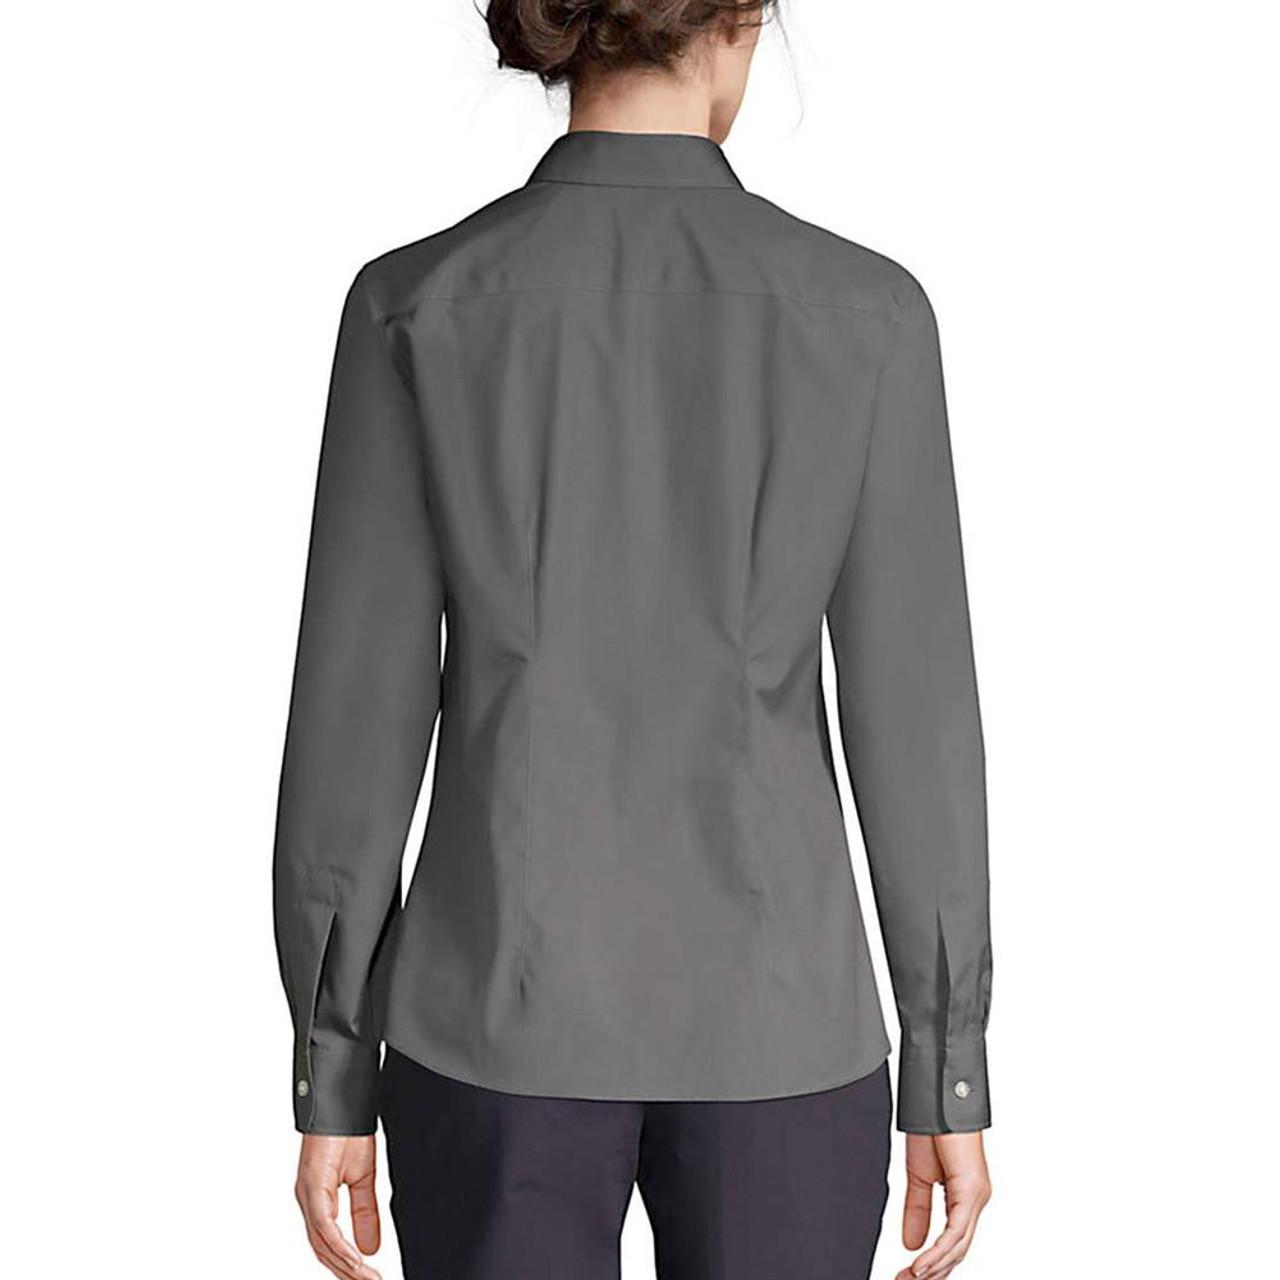 New York Mets NY Women's Long Sleeve Dress Shirt